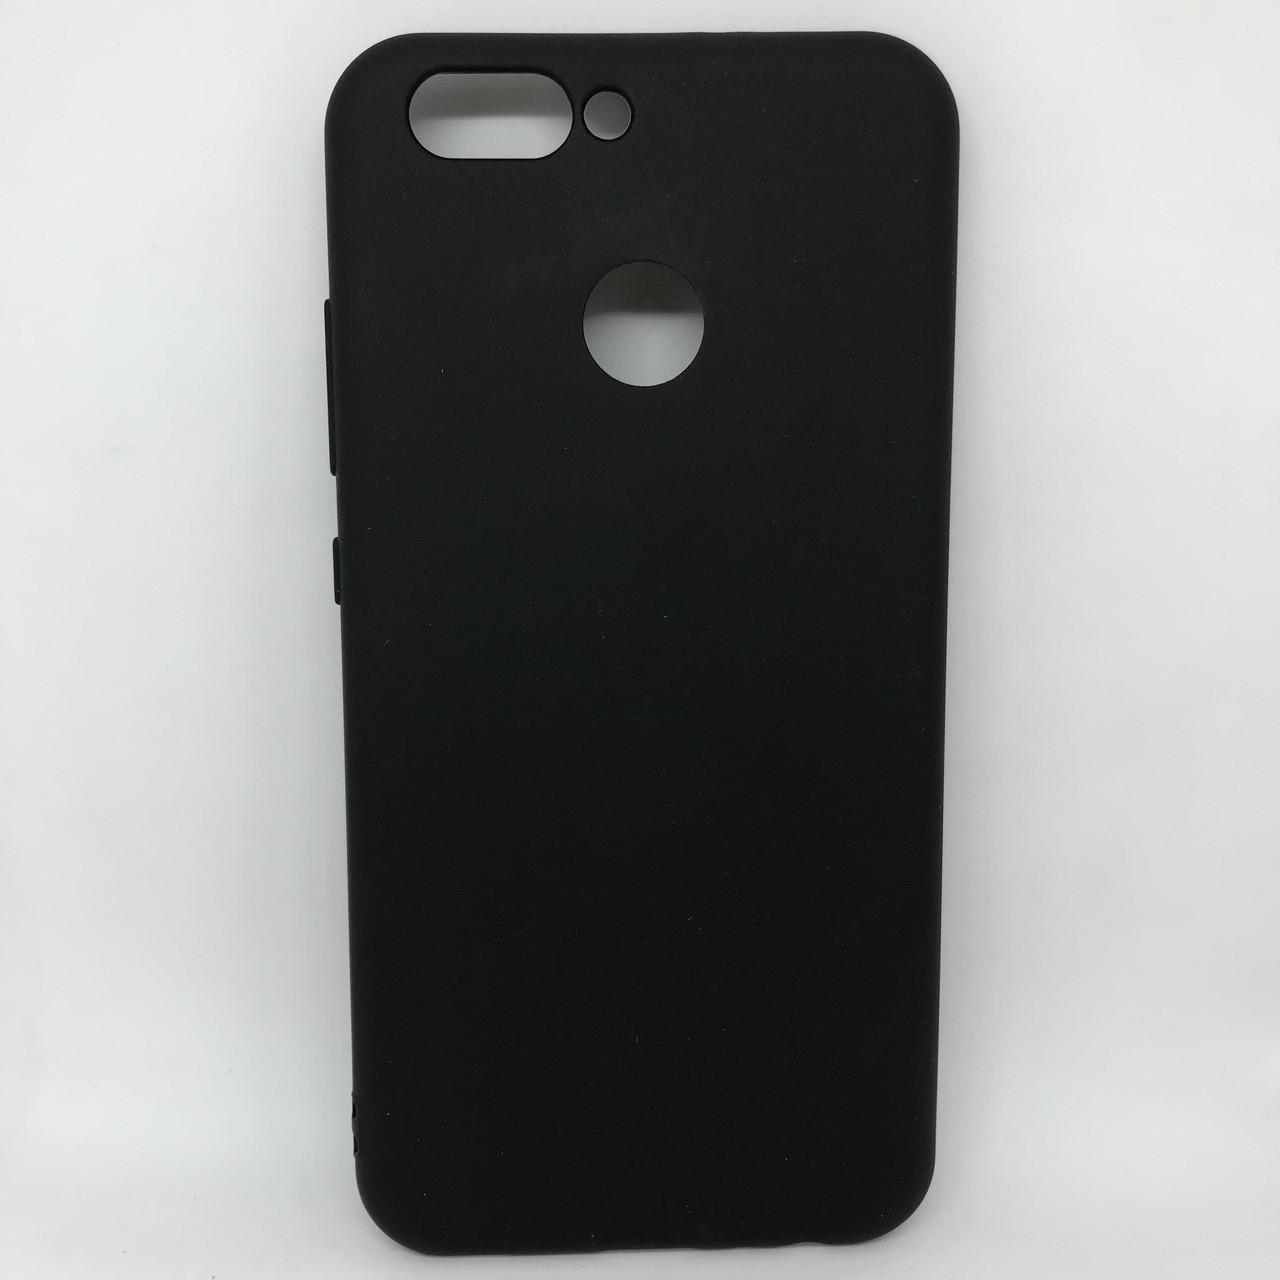 Чехол-накладка silicone Huawei Nova 2 черный